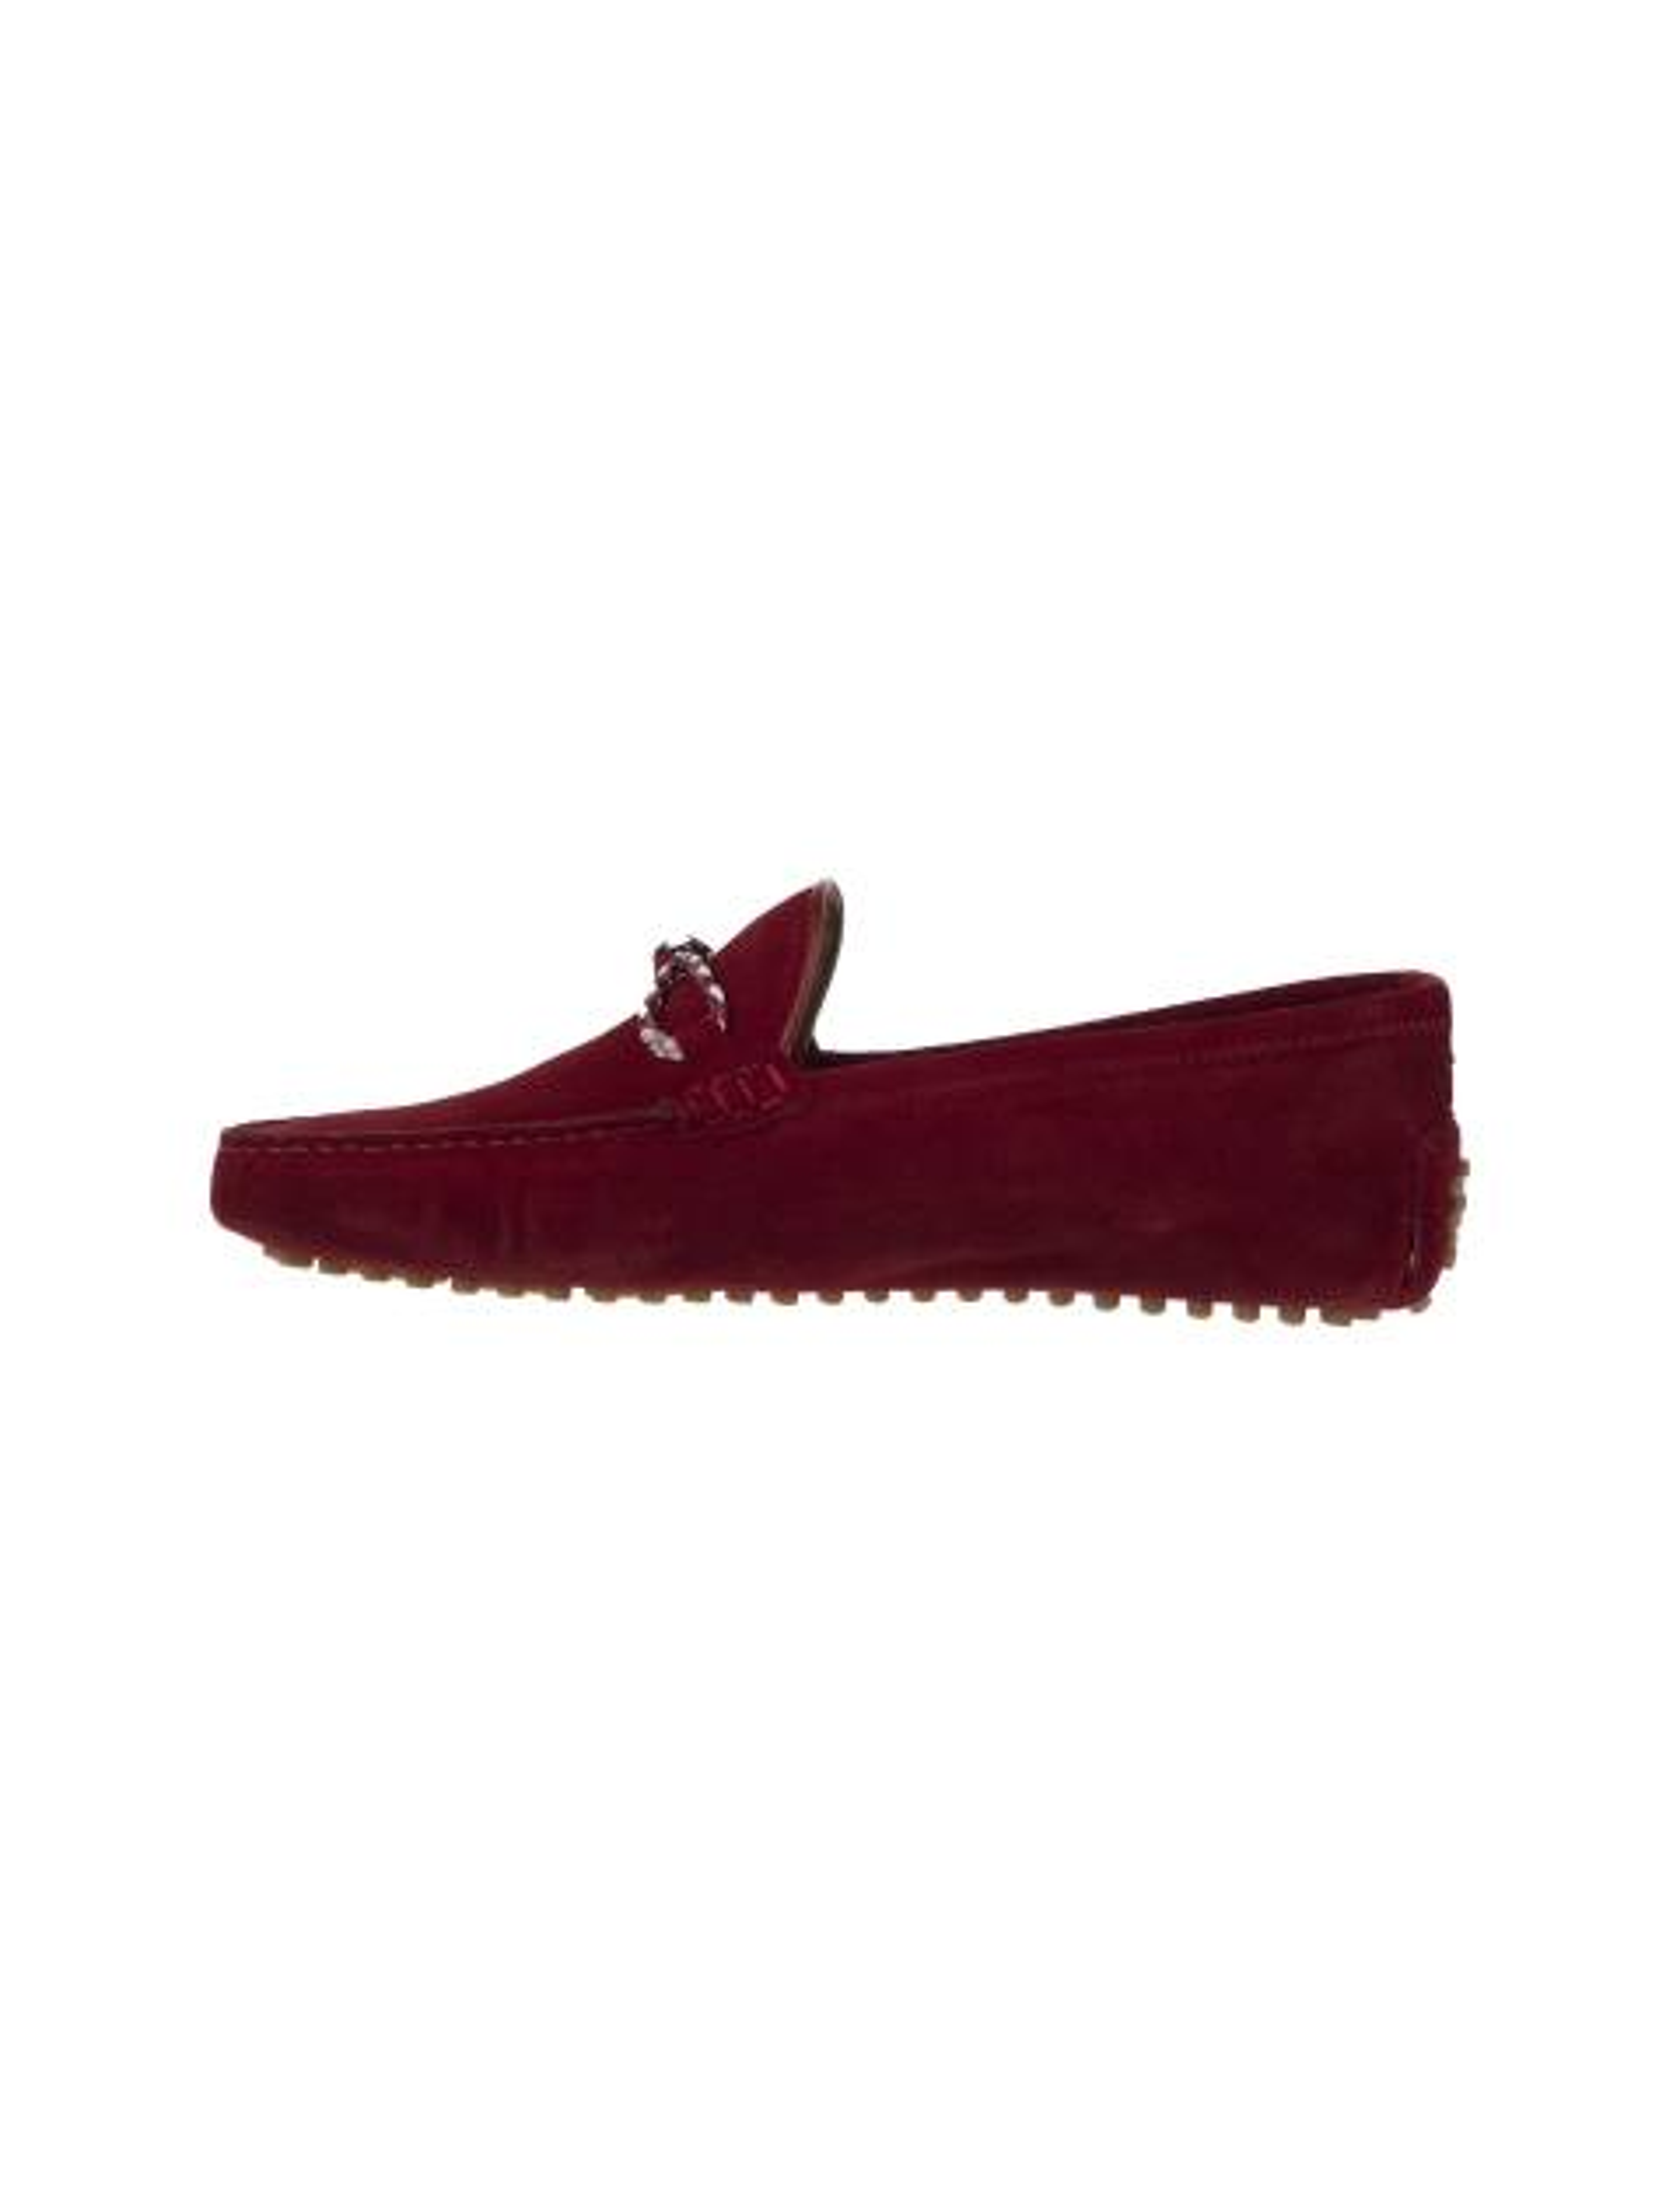 کفش چرم راحتی یکسره مردانه - قرمز - 2